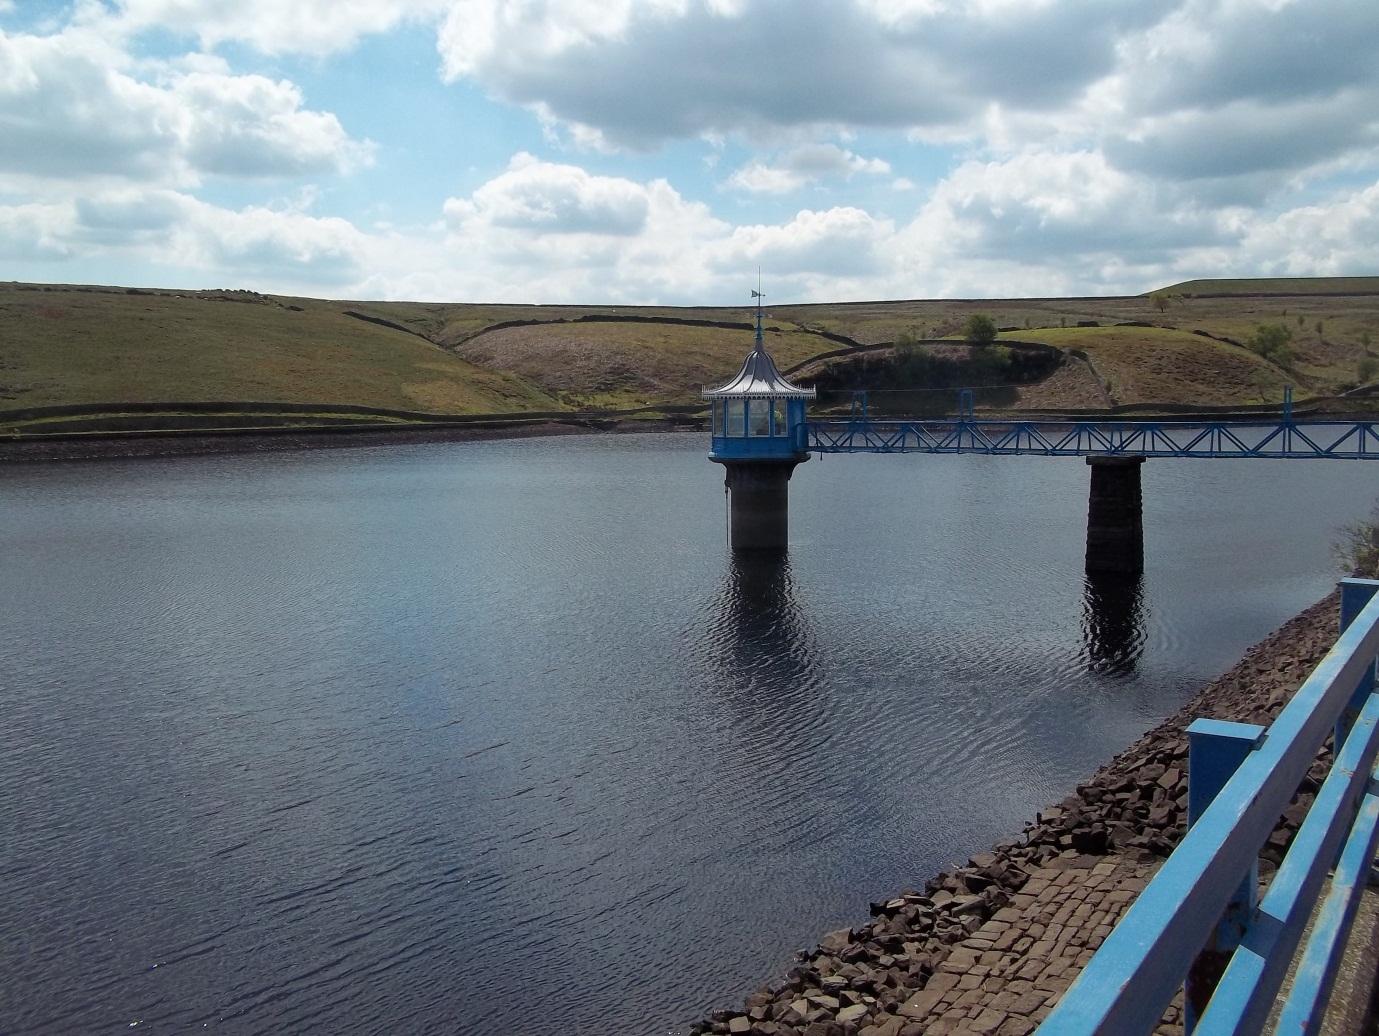 Stubden Reservoir Gets Some Improvements